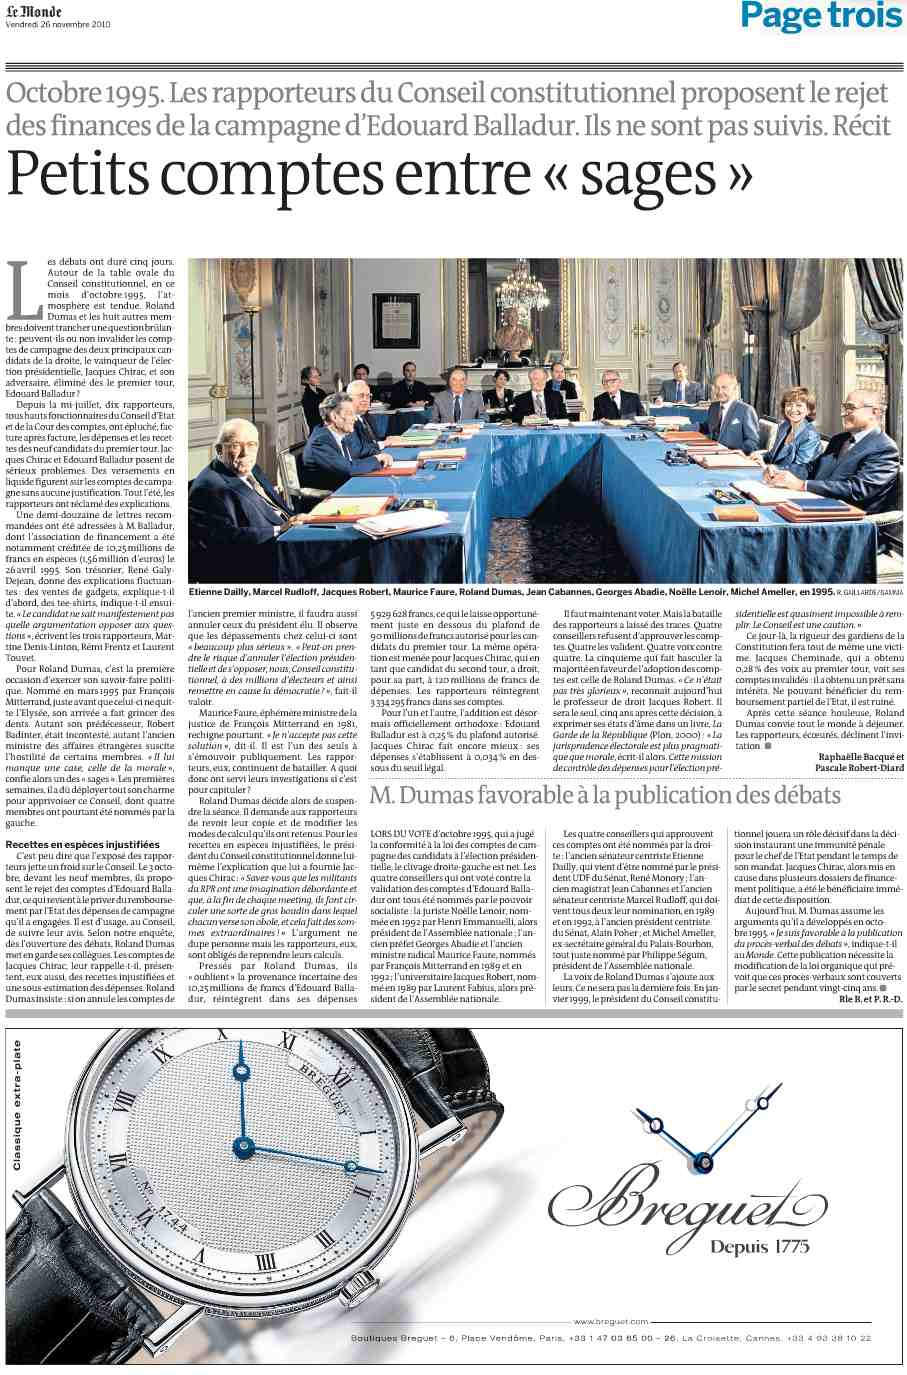 Le Monde, 26 nov